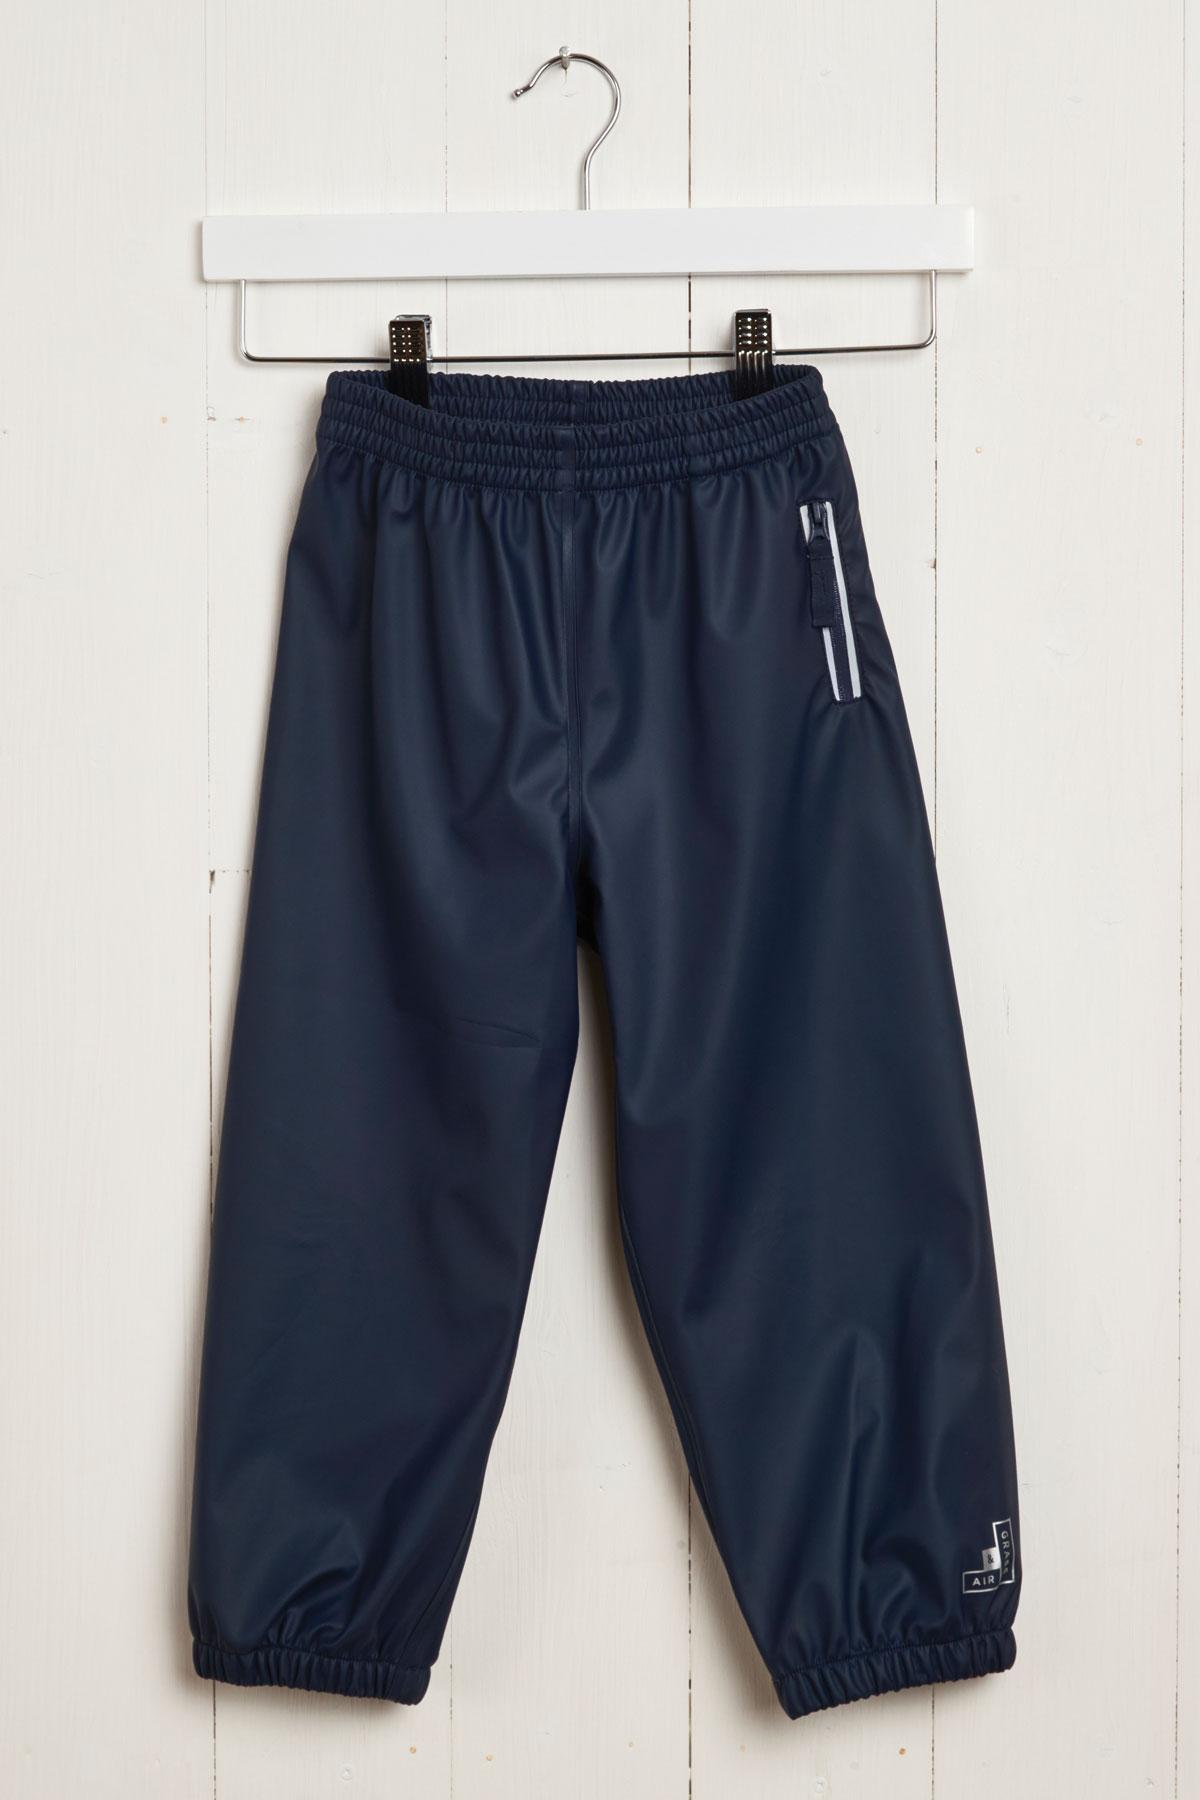 Grass & Air Rain Runners: Kids Navy Waterproof Trousers